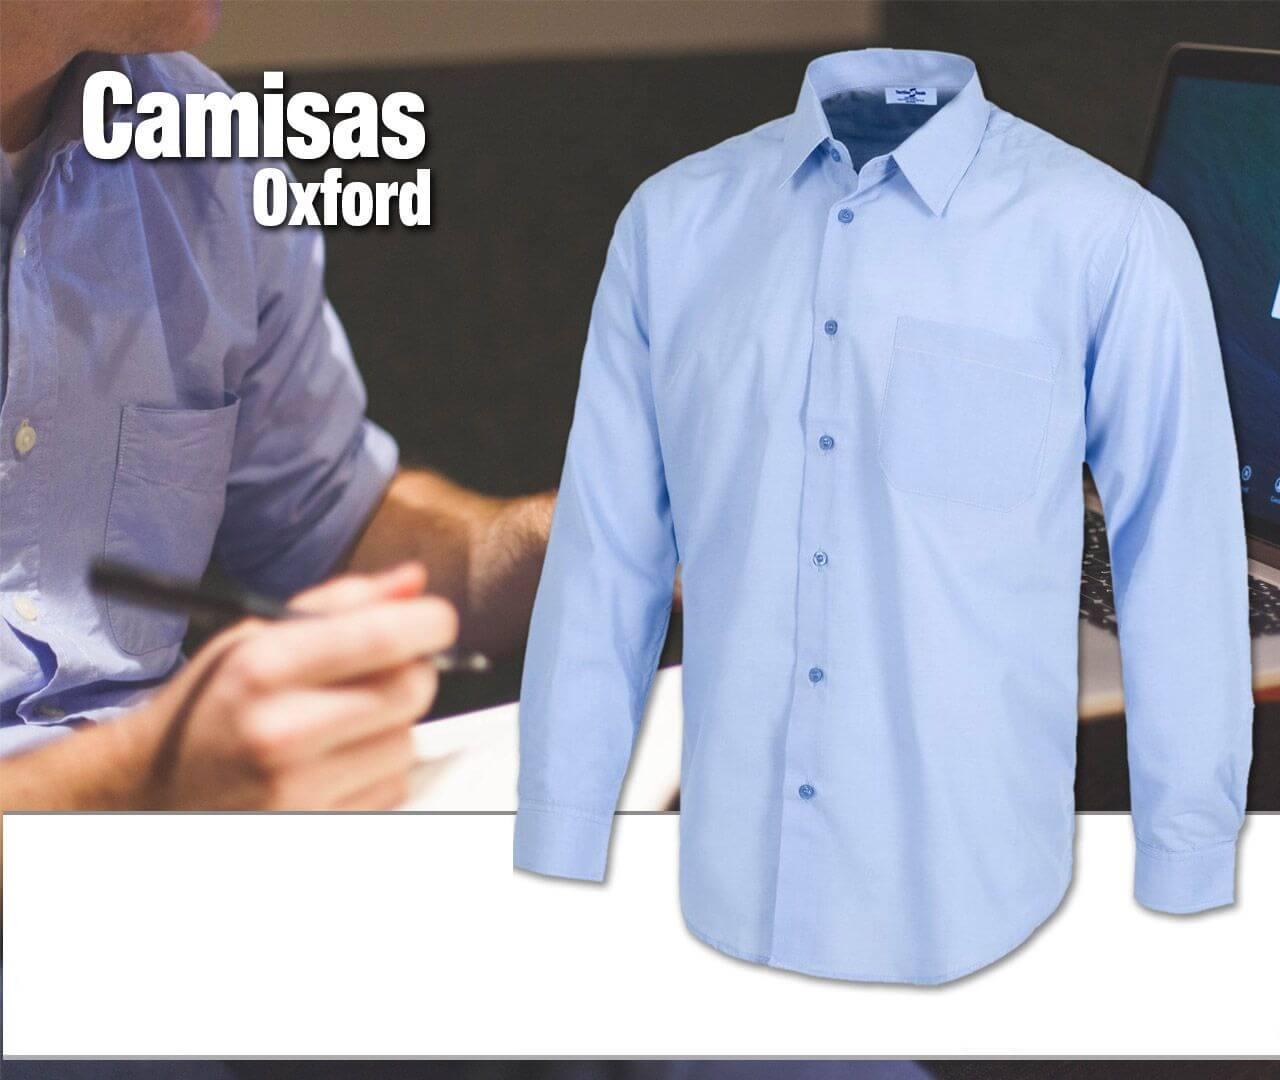 CAMISAS OXFORD PARA UNIFORMES - Camisas Oxford para Empresas